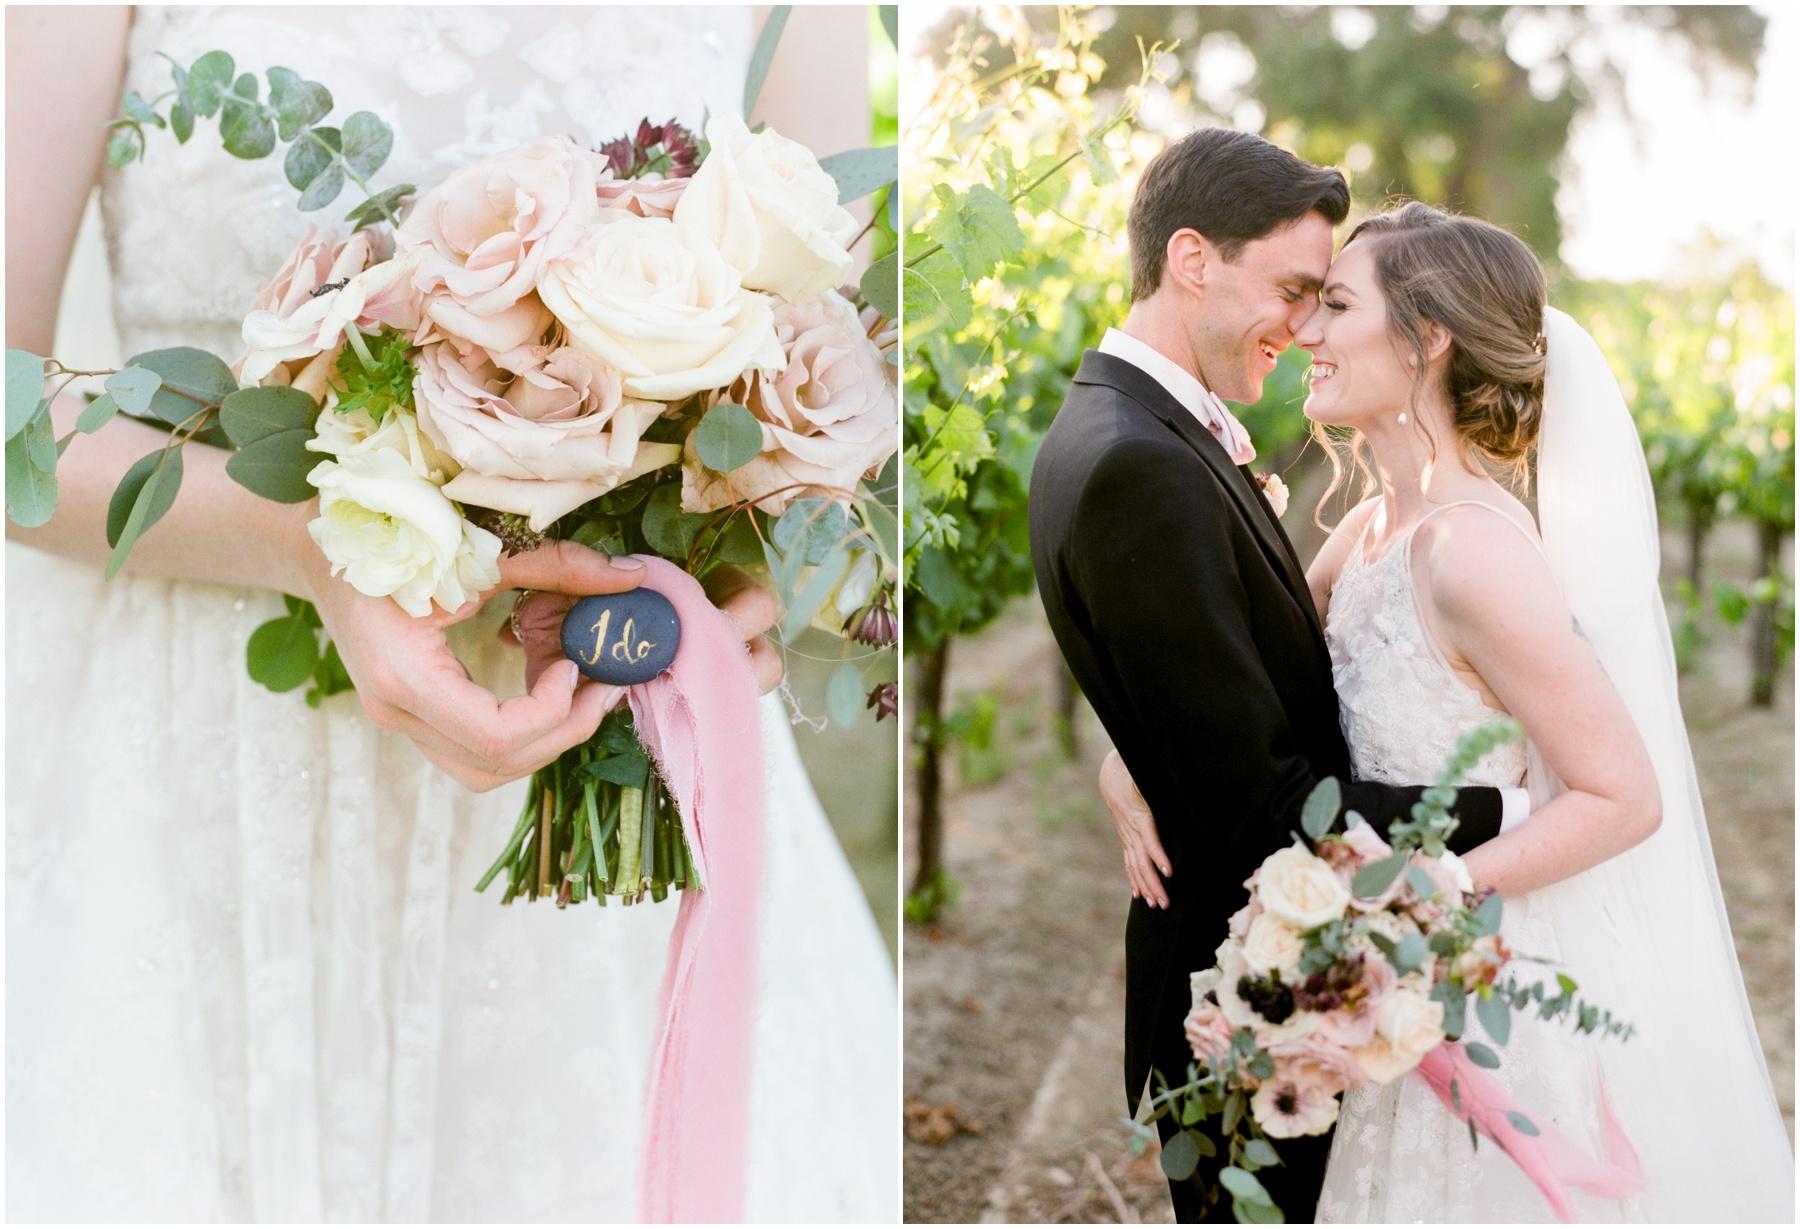 Scribner-bend-vineyards-wedding-sacramento-california-Kristine-Herman-Photography-39.jpg